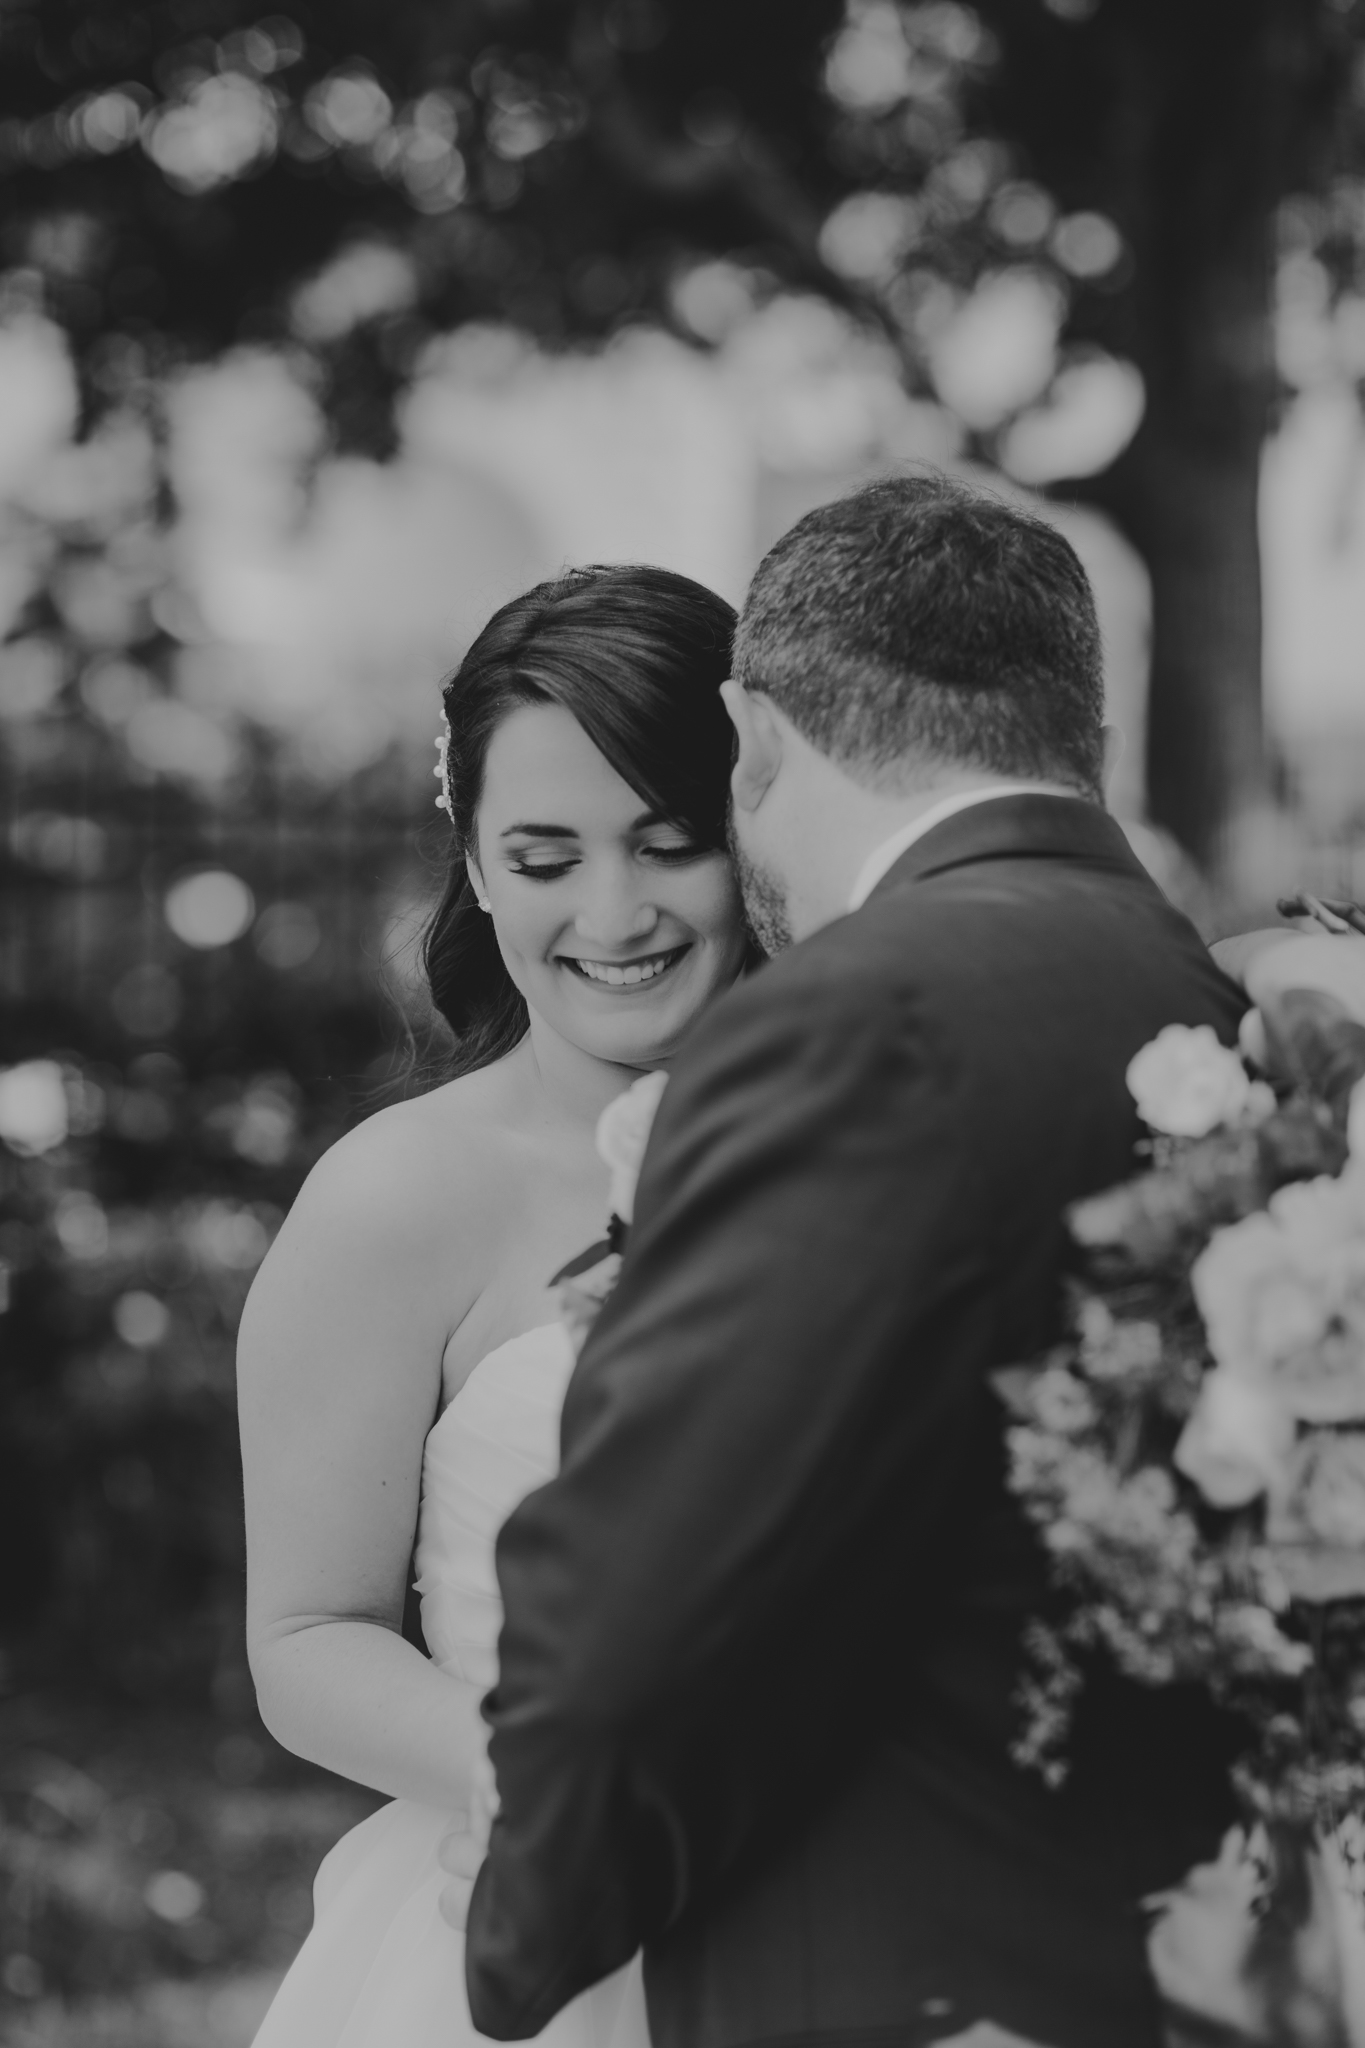 Leah Nicole Photography - Houston Wedding Photographer-Lake Conroe Wedding- Houston Wedding Photographer-22.jpg